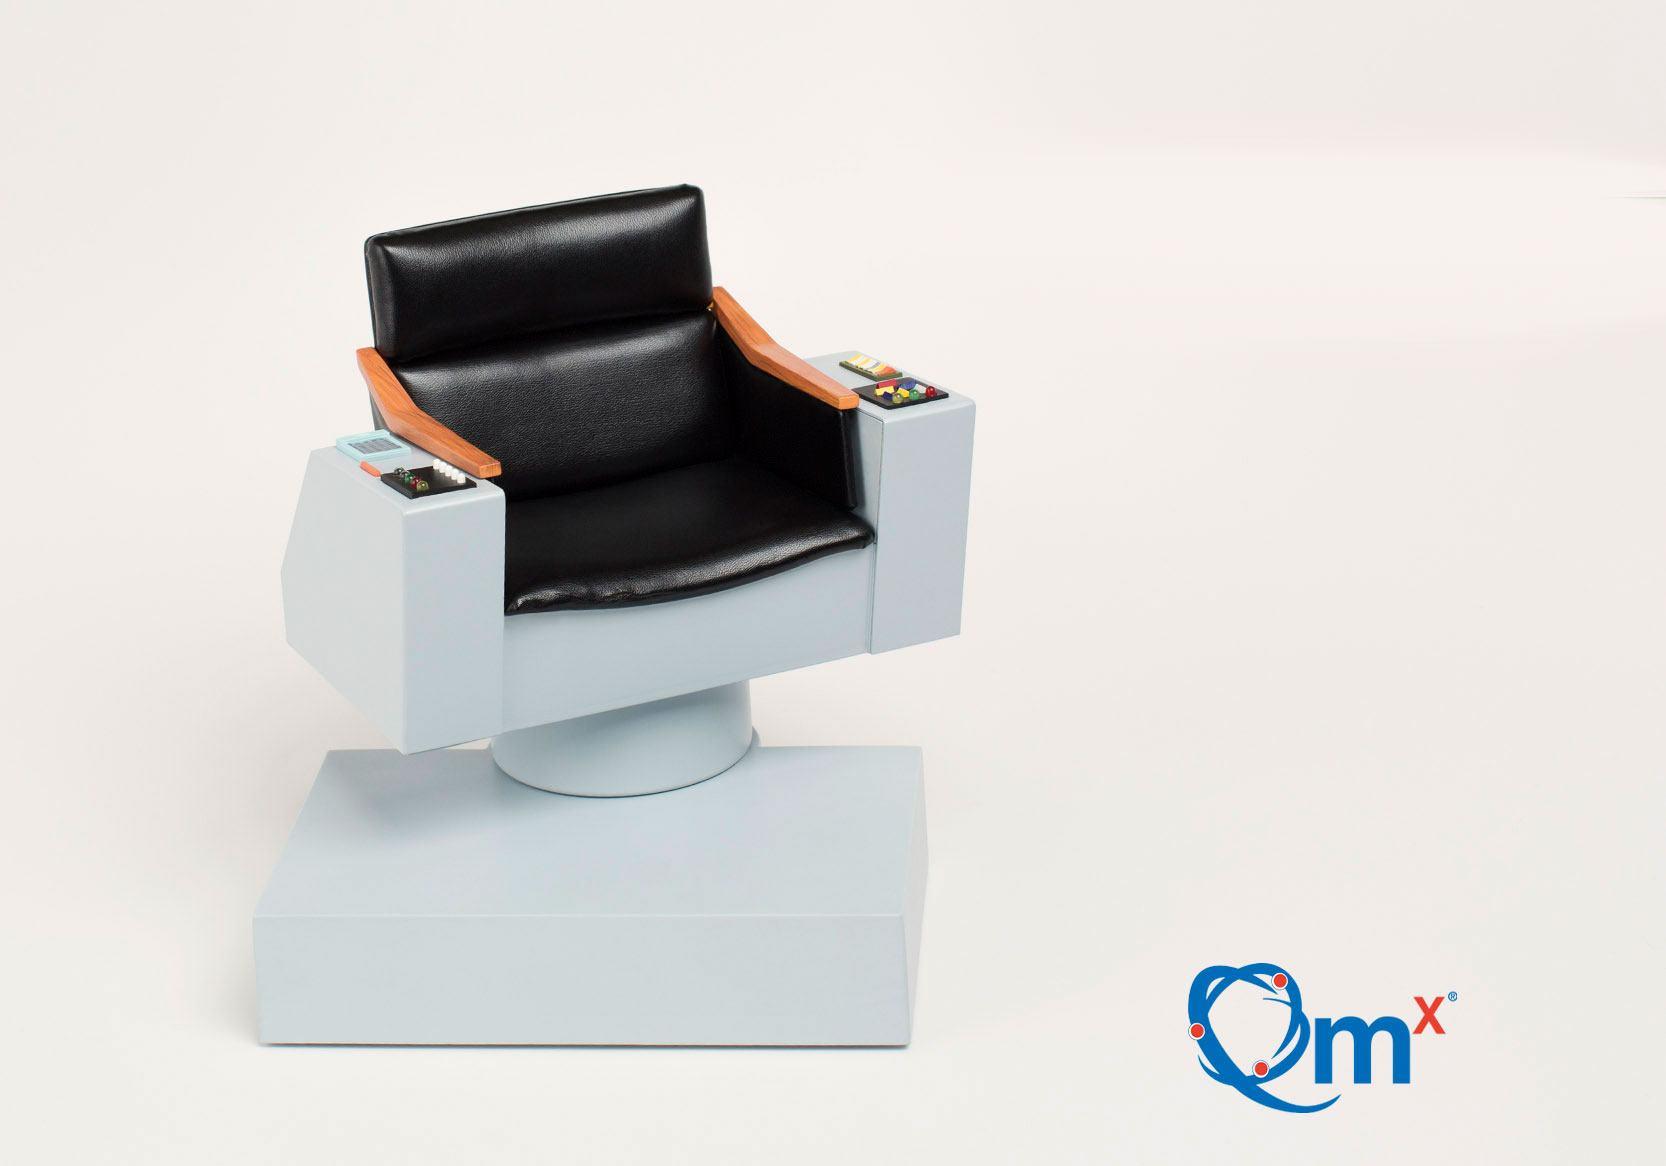 star trek captains chair ergonomic office with lumbar support quantum mechanix